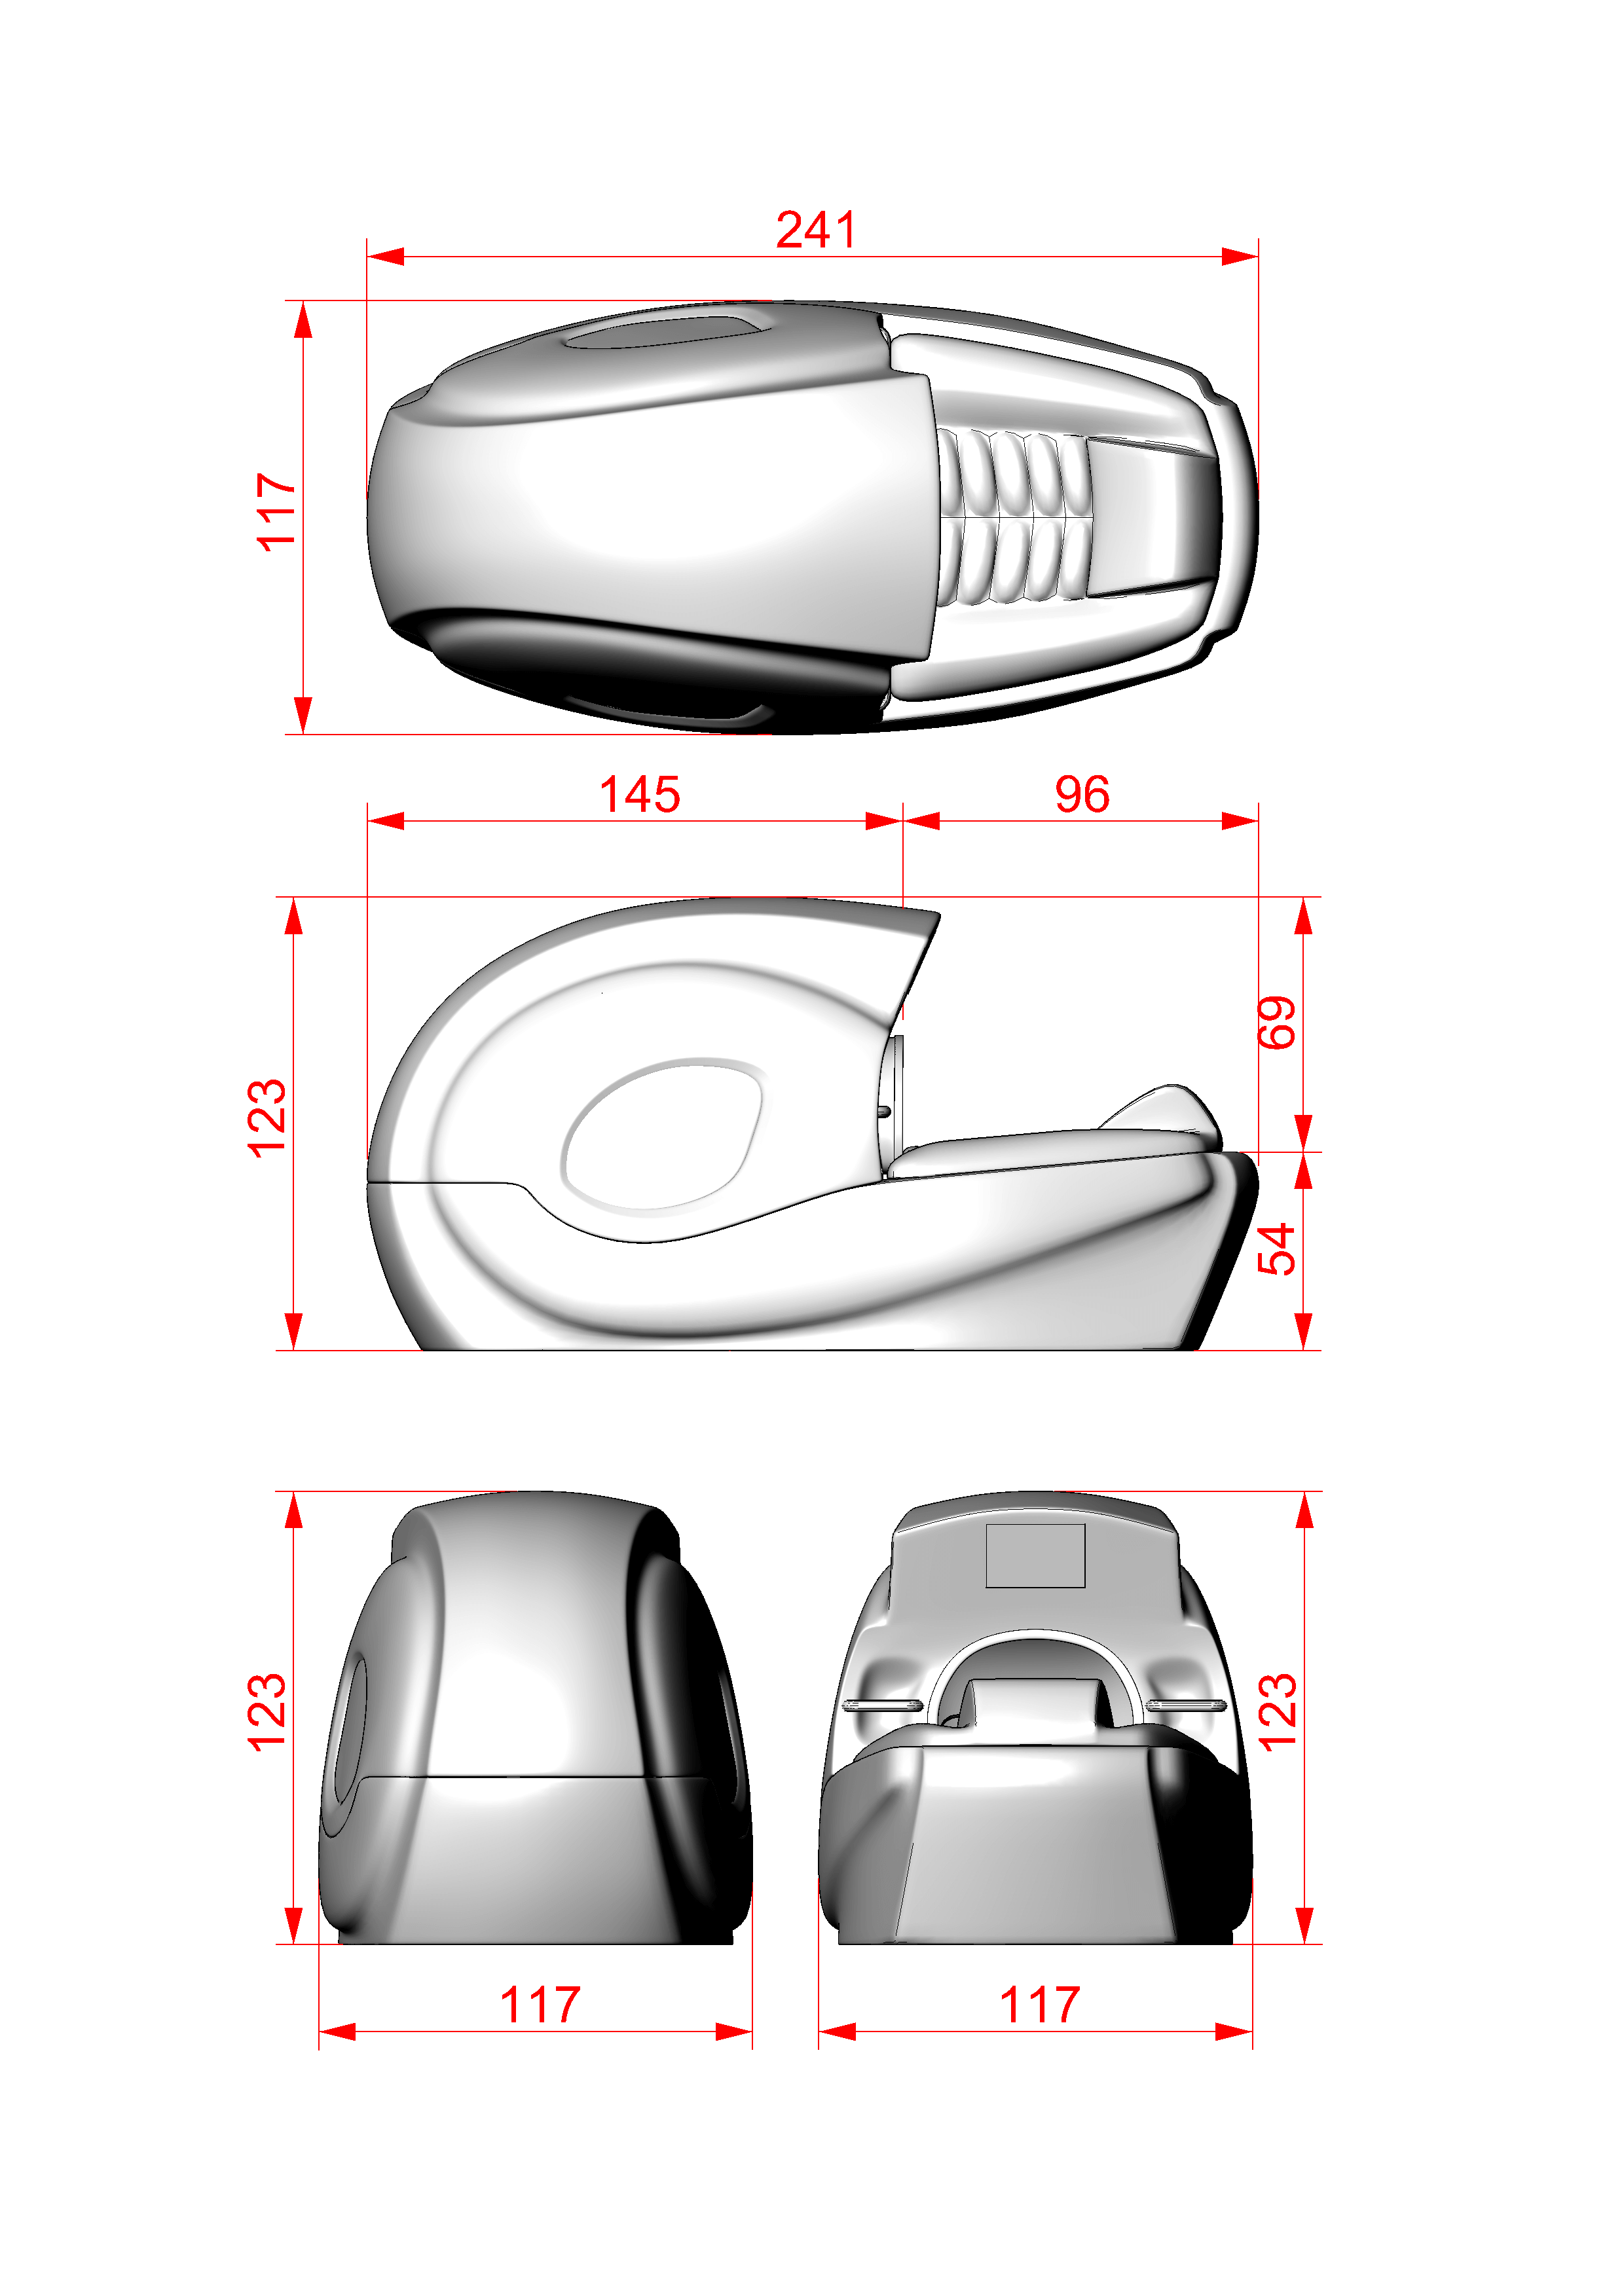 infraShapeHorizontal_01 (1)